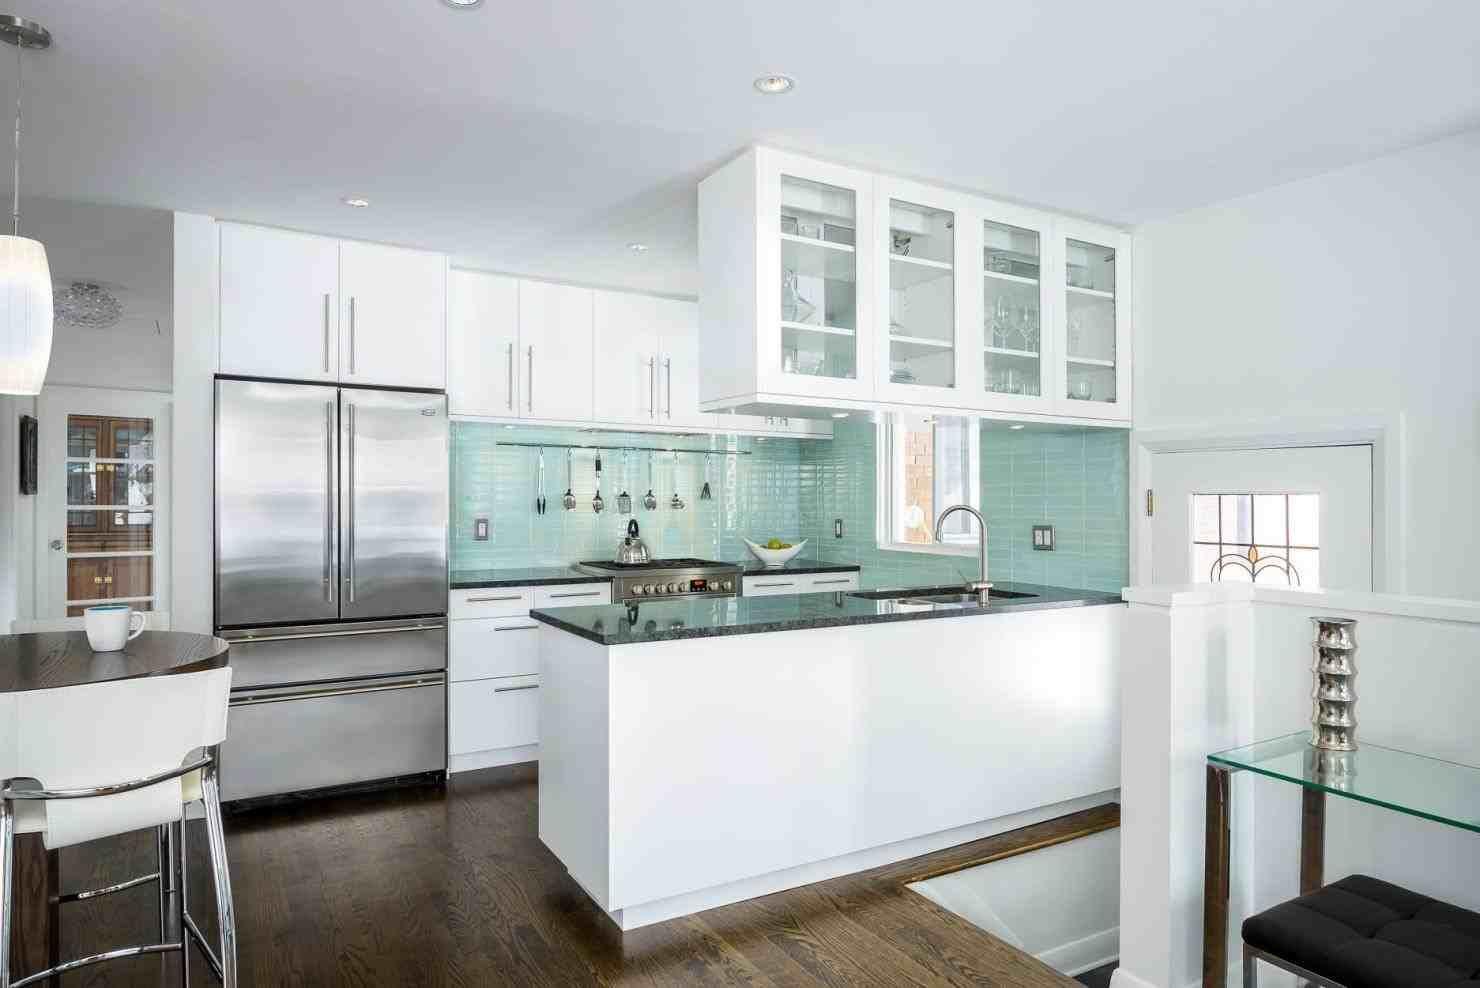 small modern kitchen designs 2017 | Home Ideas | Pinterest | Small ...